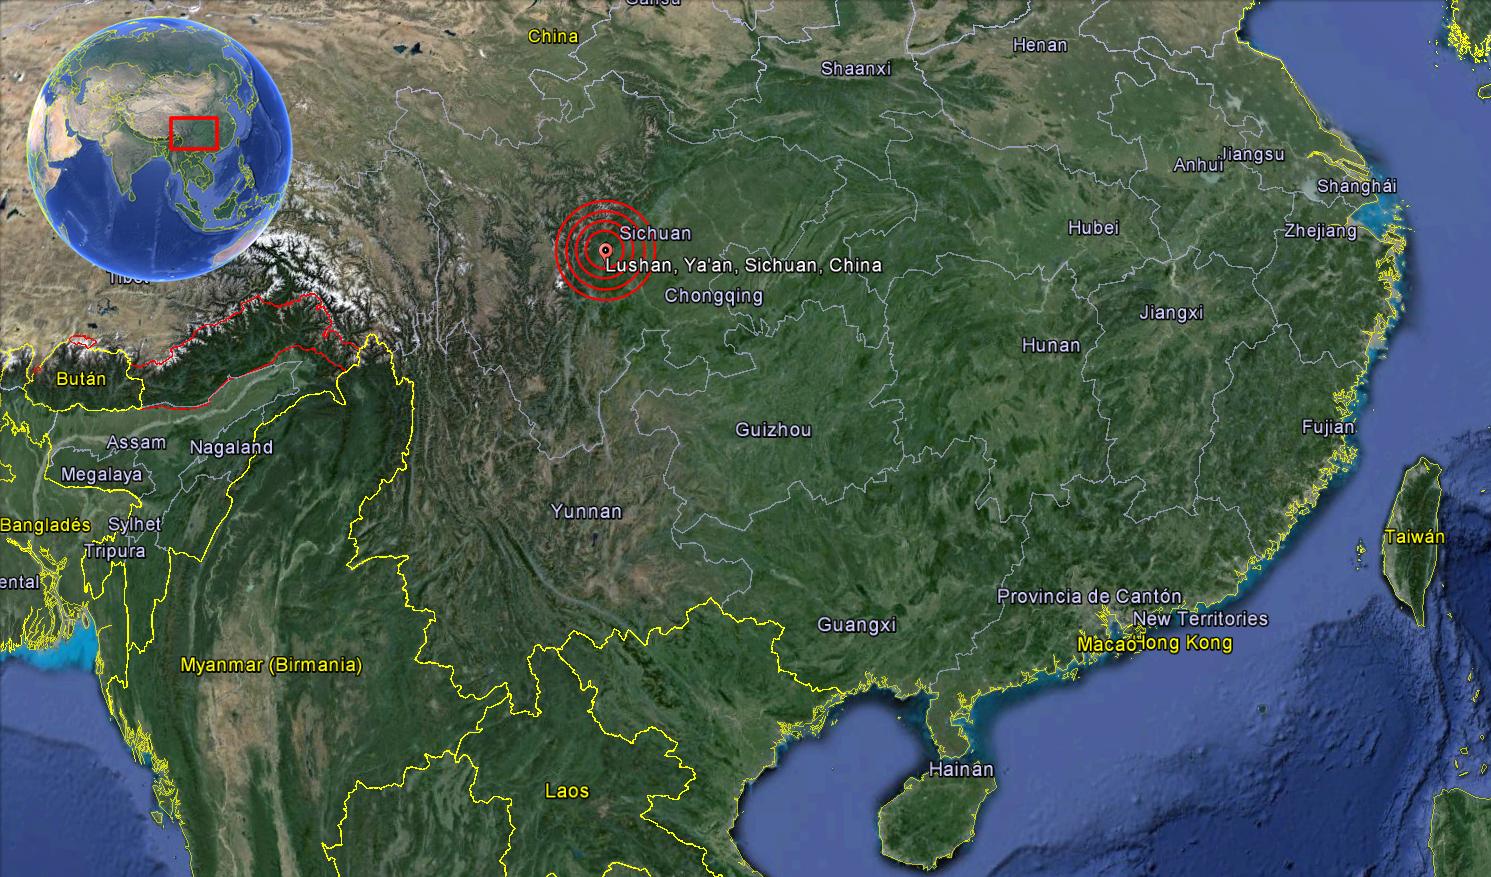 Terremoto Sichuan 20 abril 2013